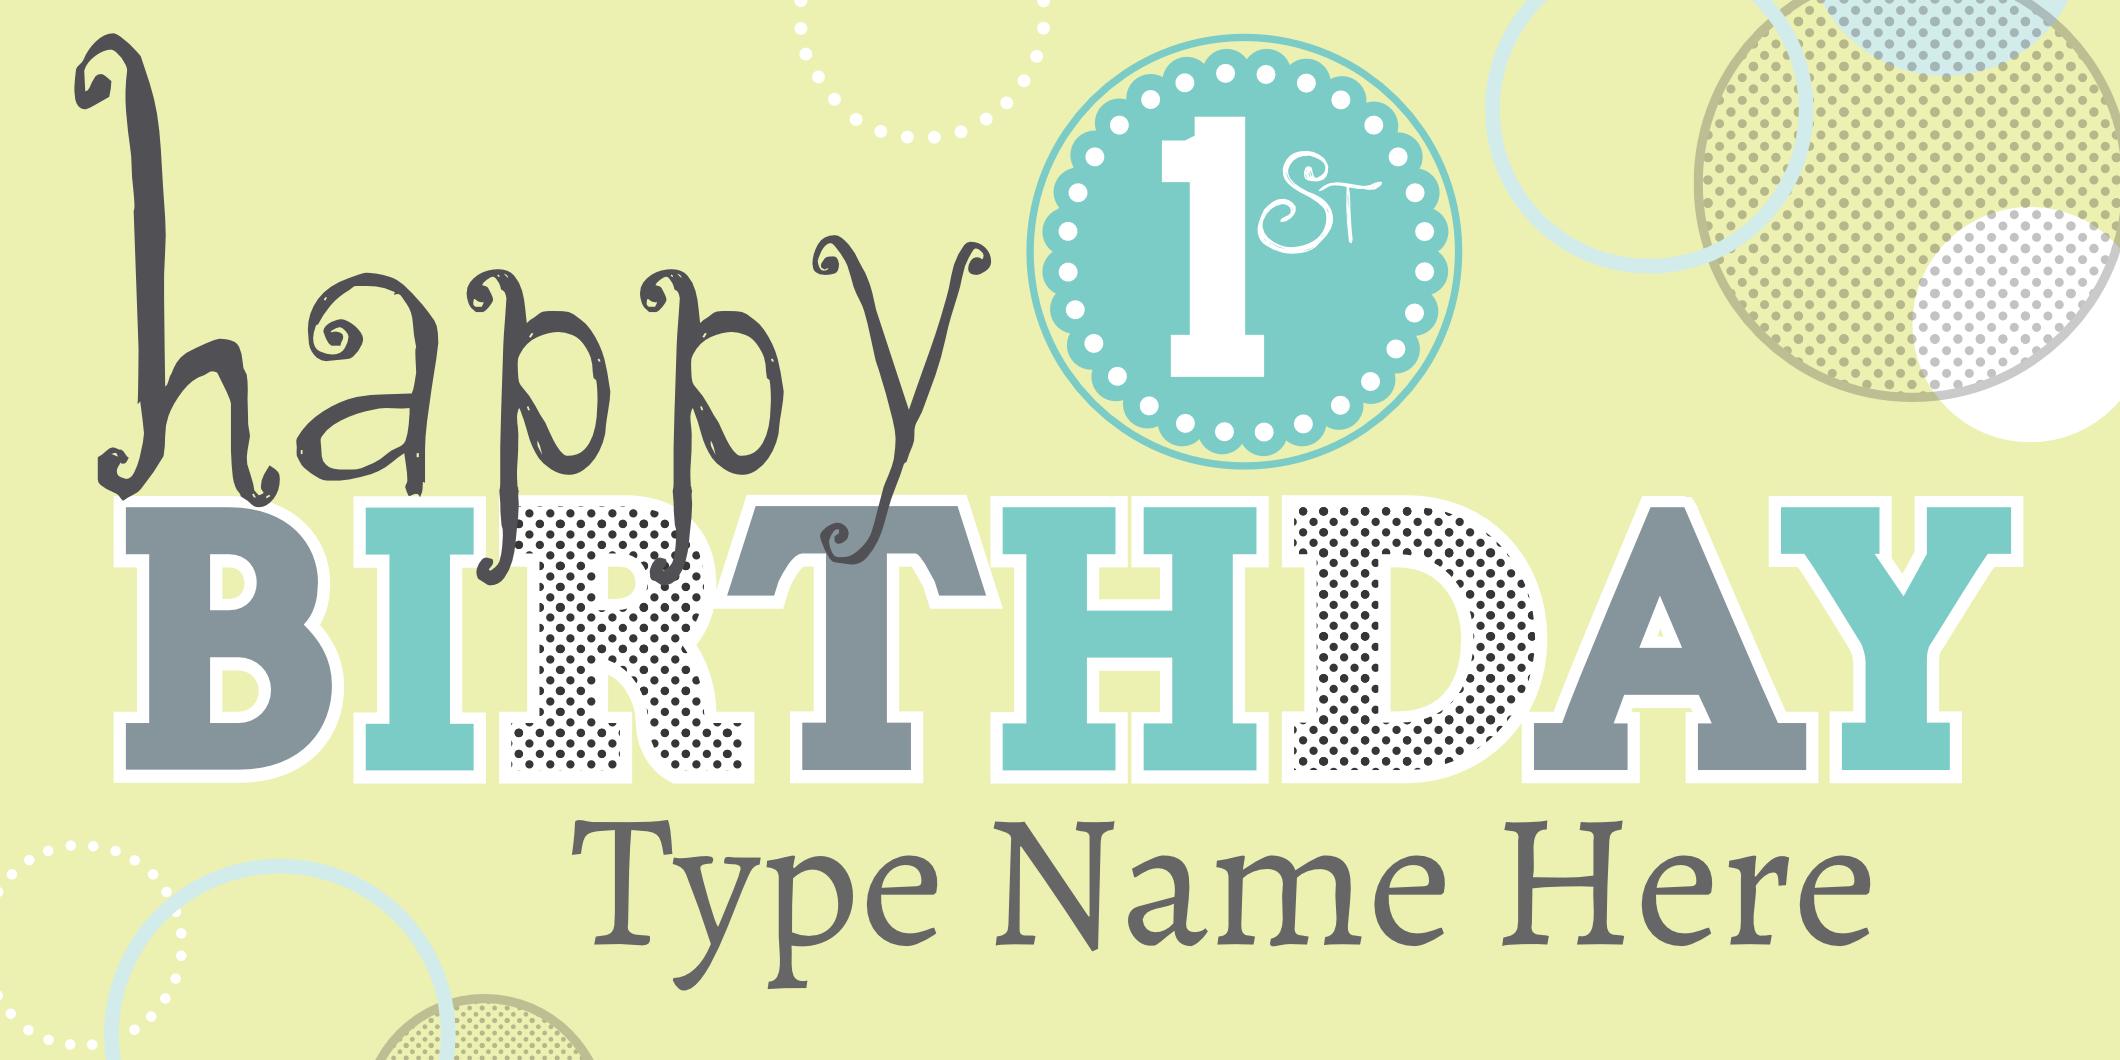 Happy 1st Birthday Sign Template Www Signs Com 1st Birthday Banners Happy Birthday Posters Happy 1st Birthdays